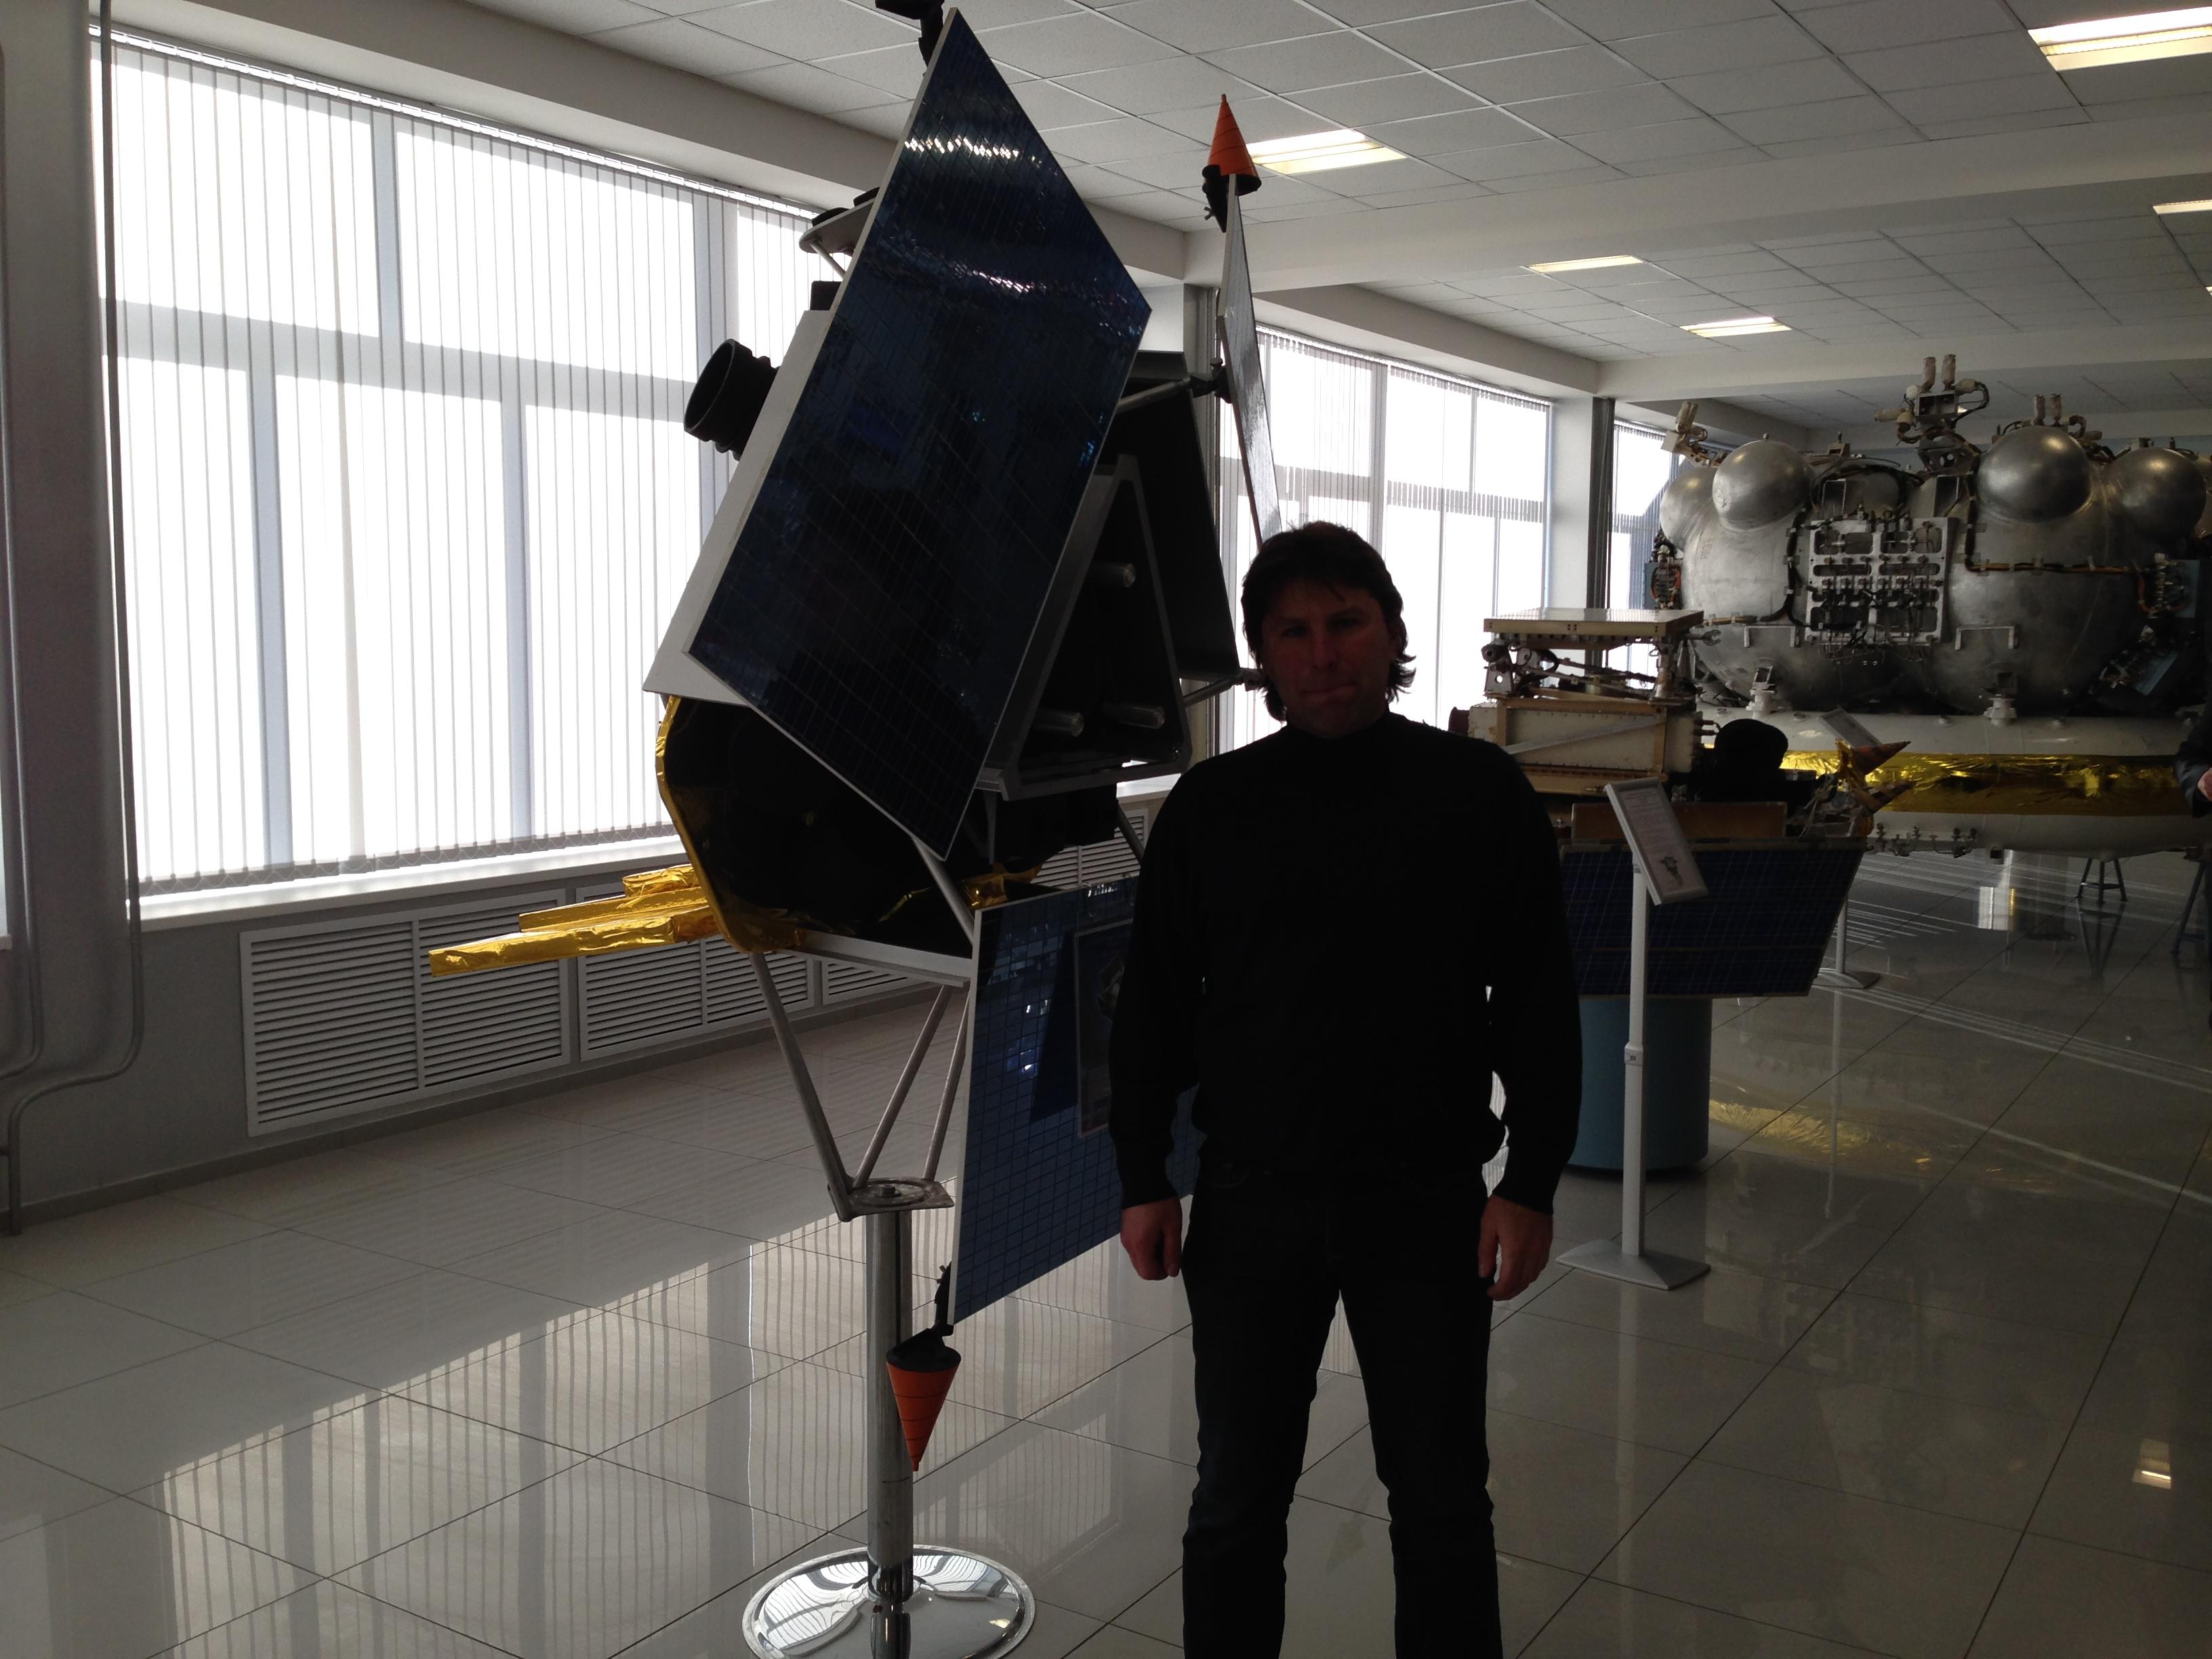 31 января 2014 года. Музей НПО-Л. XXXVIII чтения по космонавтике. Я и Карат в заходе